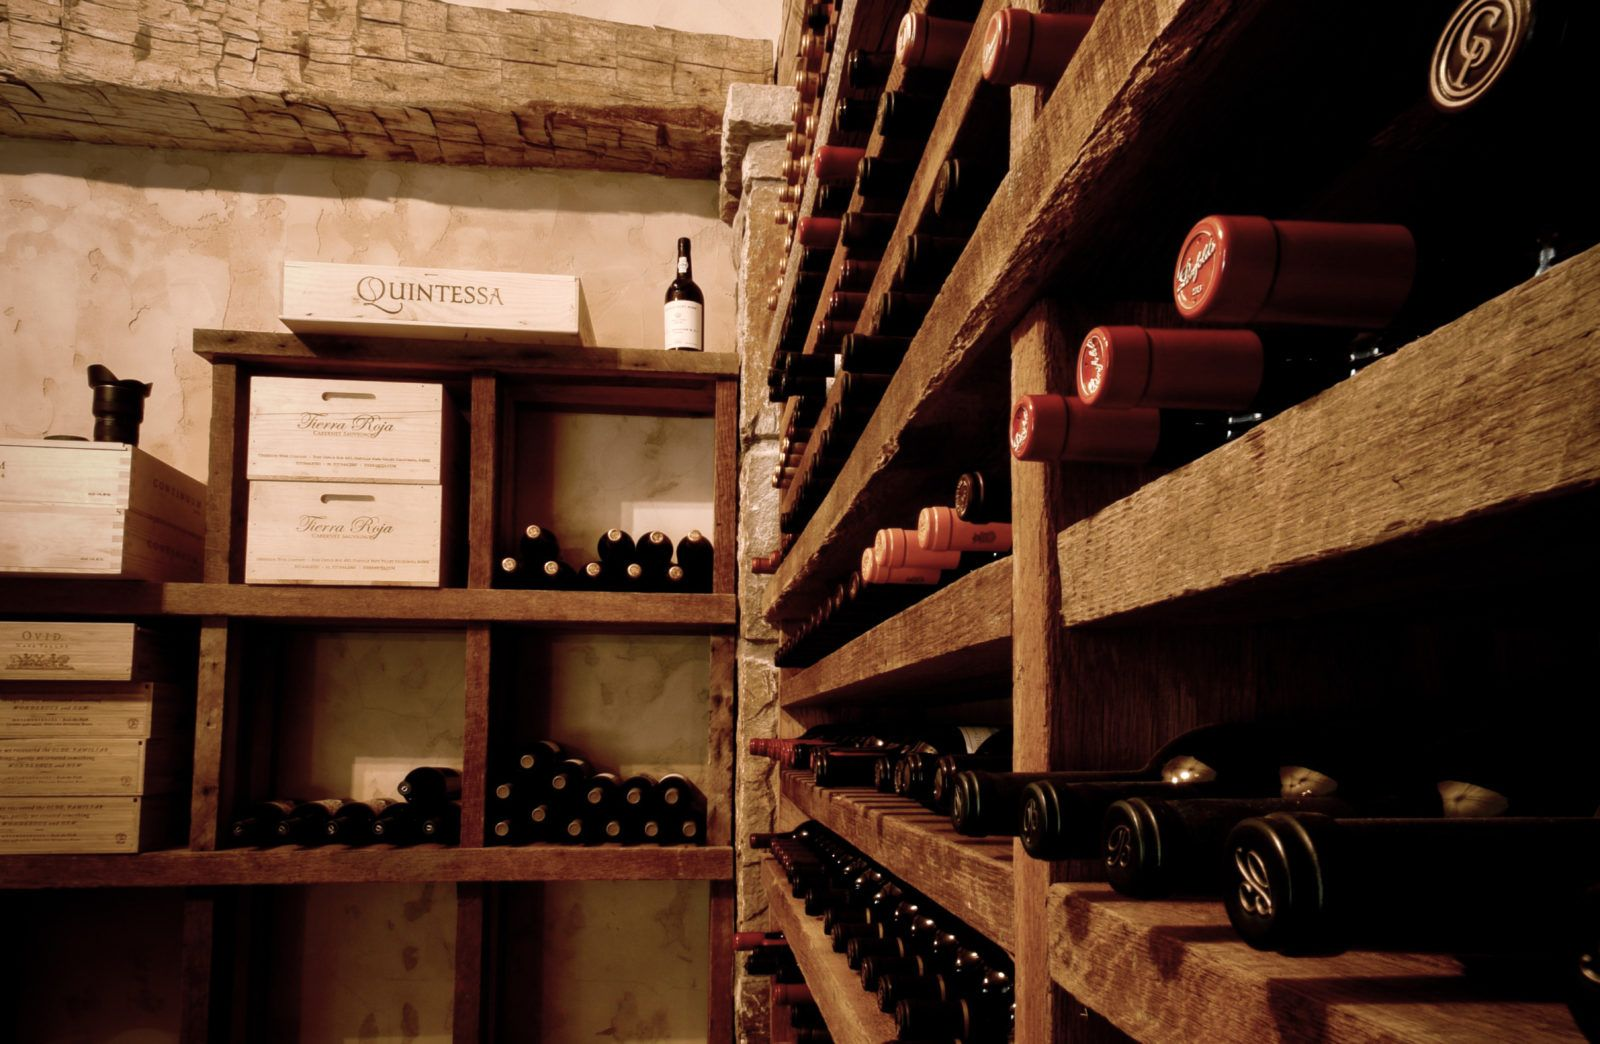 Wine cellar oldworld hideaway pinterest wine cellar old